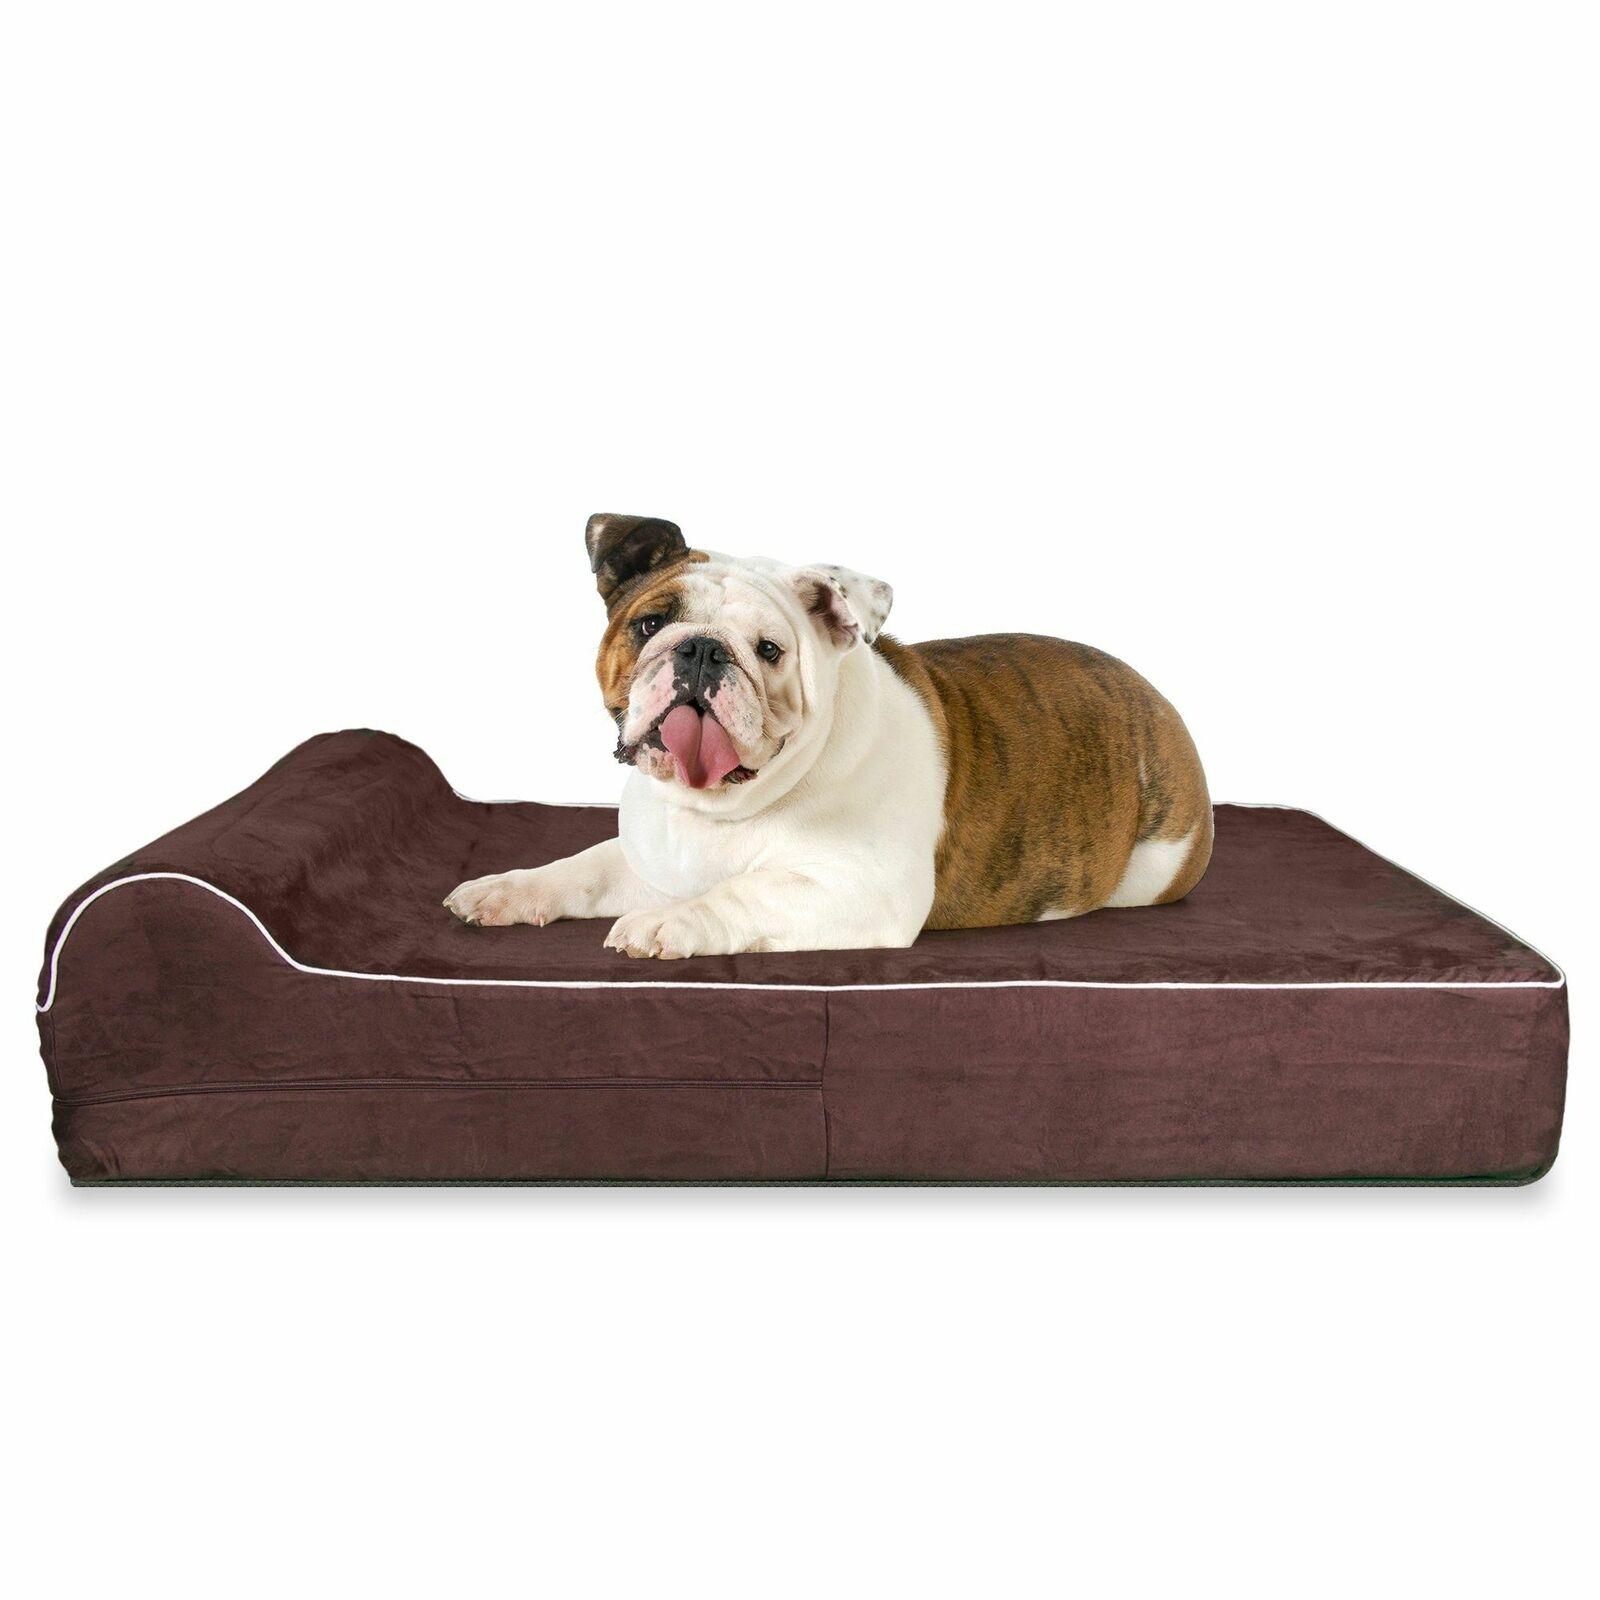 Orthopedic Waterproof Memory Foam Bed With Pillow Brown  Large